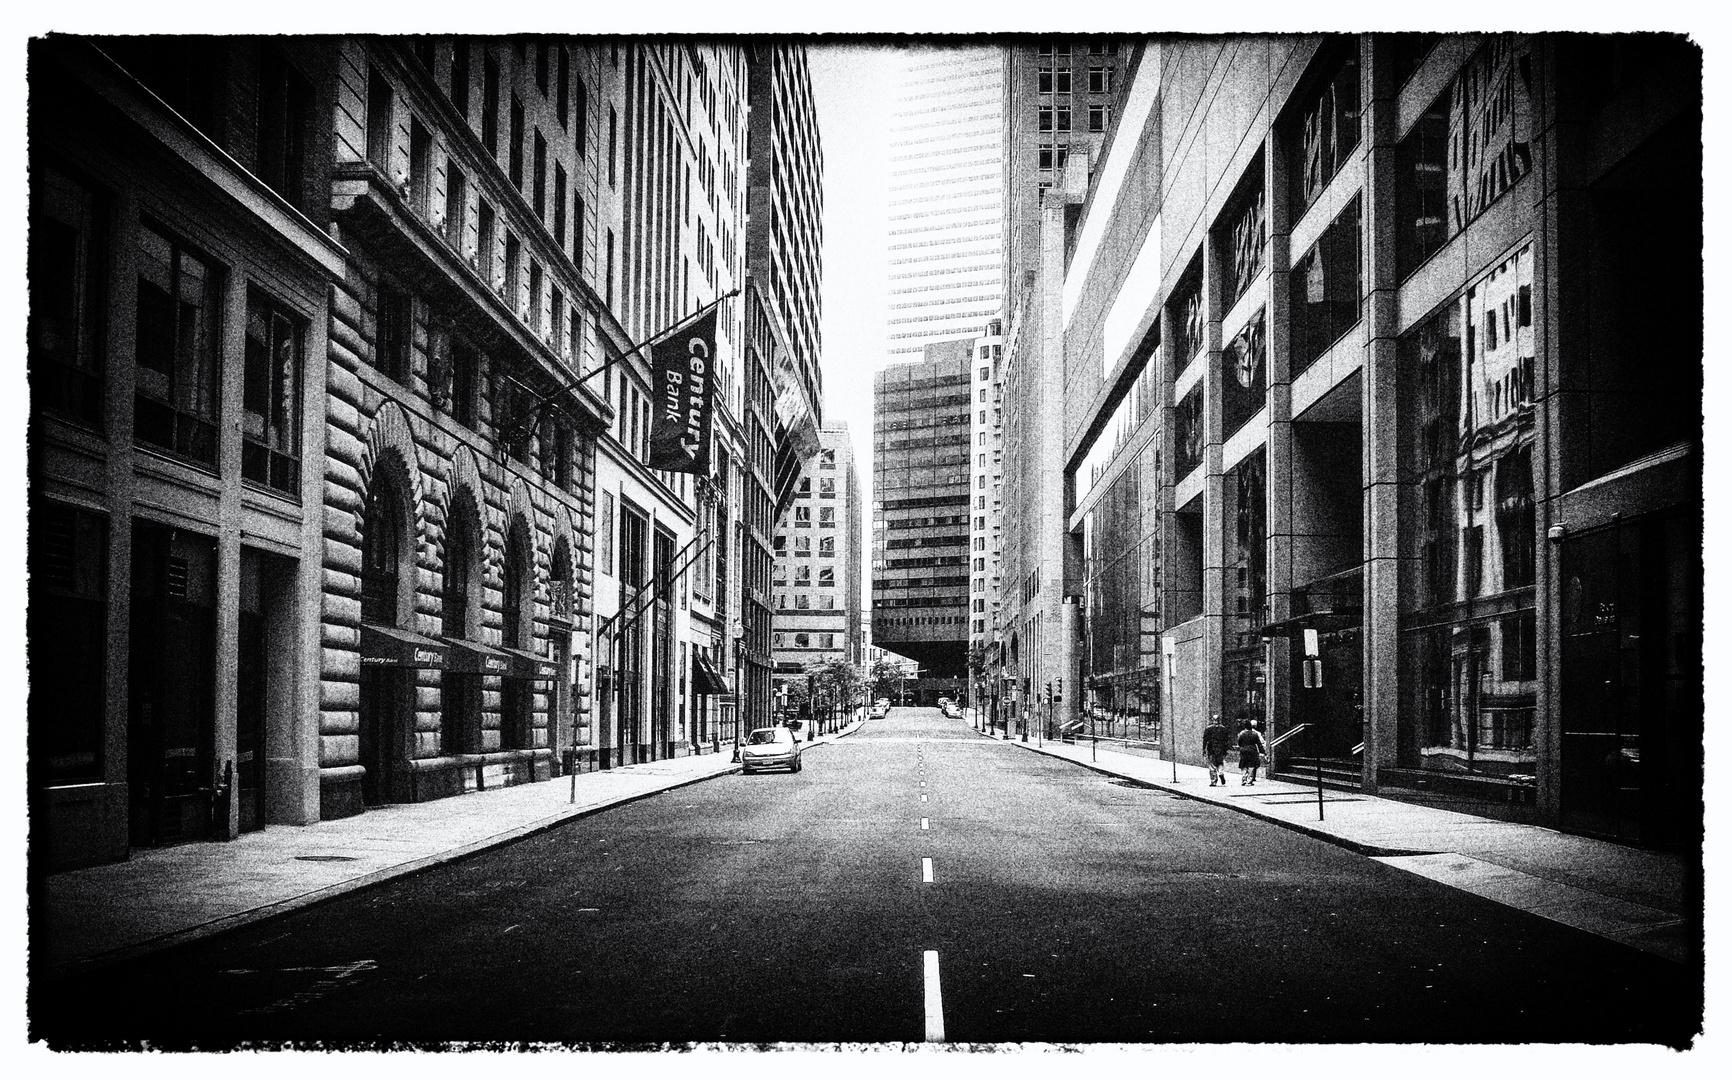 Boston -Street View